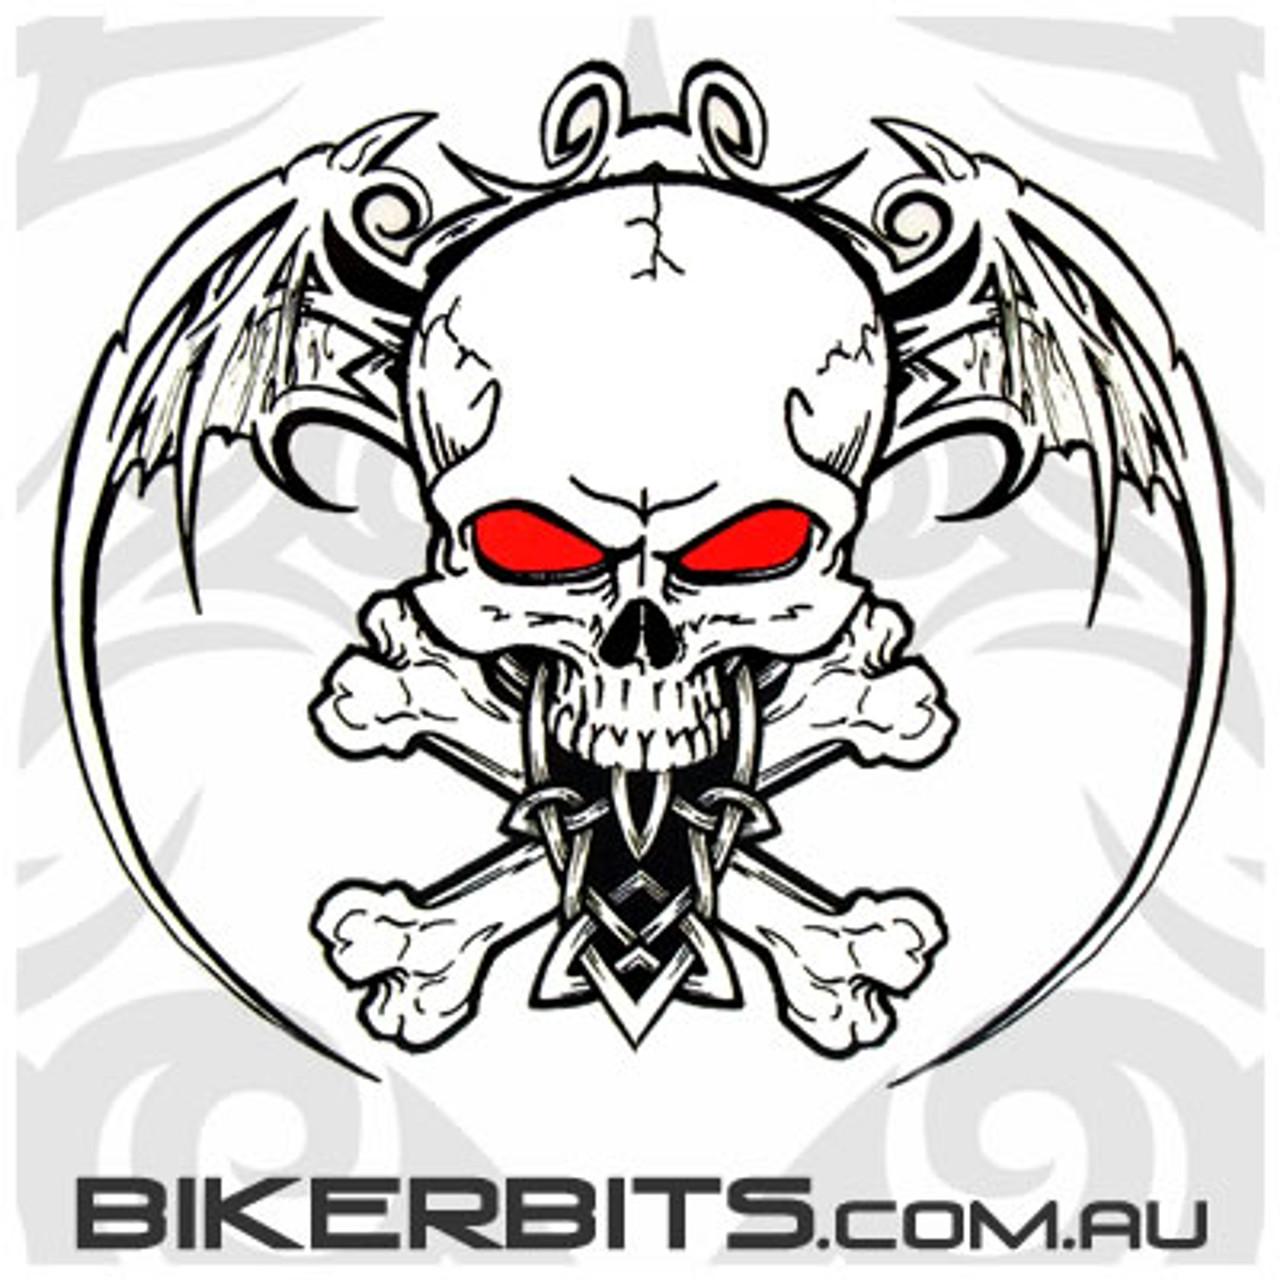 Biker Decal - Aftermath - Wingskull